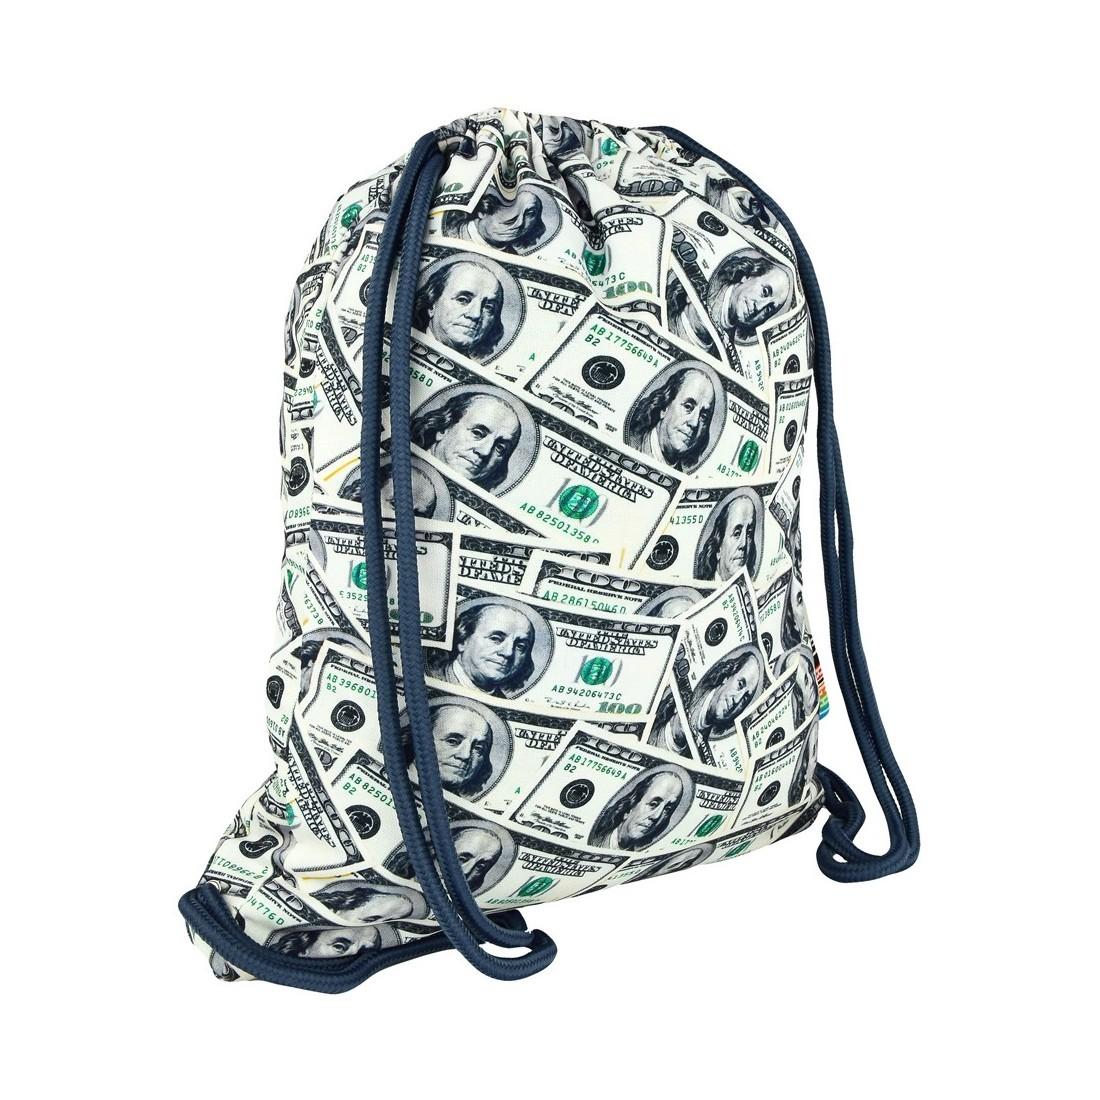 7c1b63b2465a6 Worek / plecak na sznurkach ST.RIGHT DOLLARS dolary banknoty HIT ...